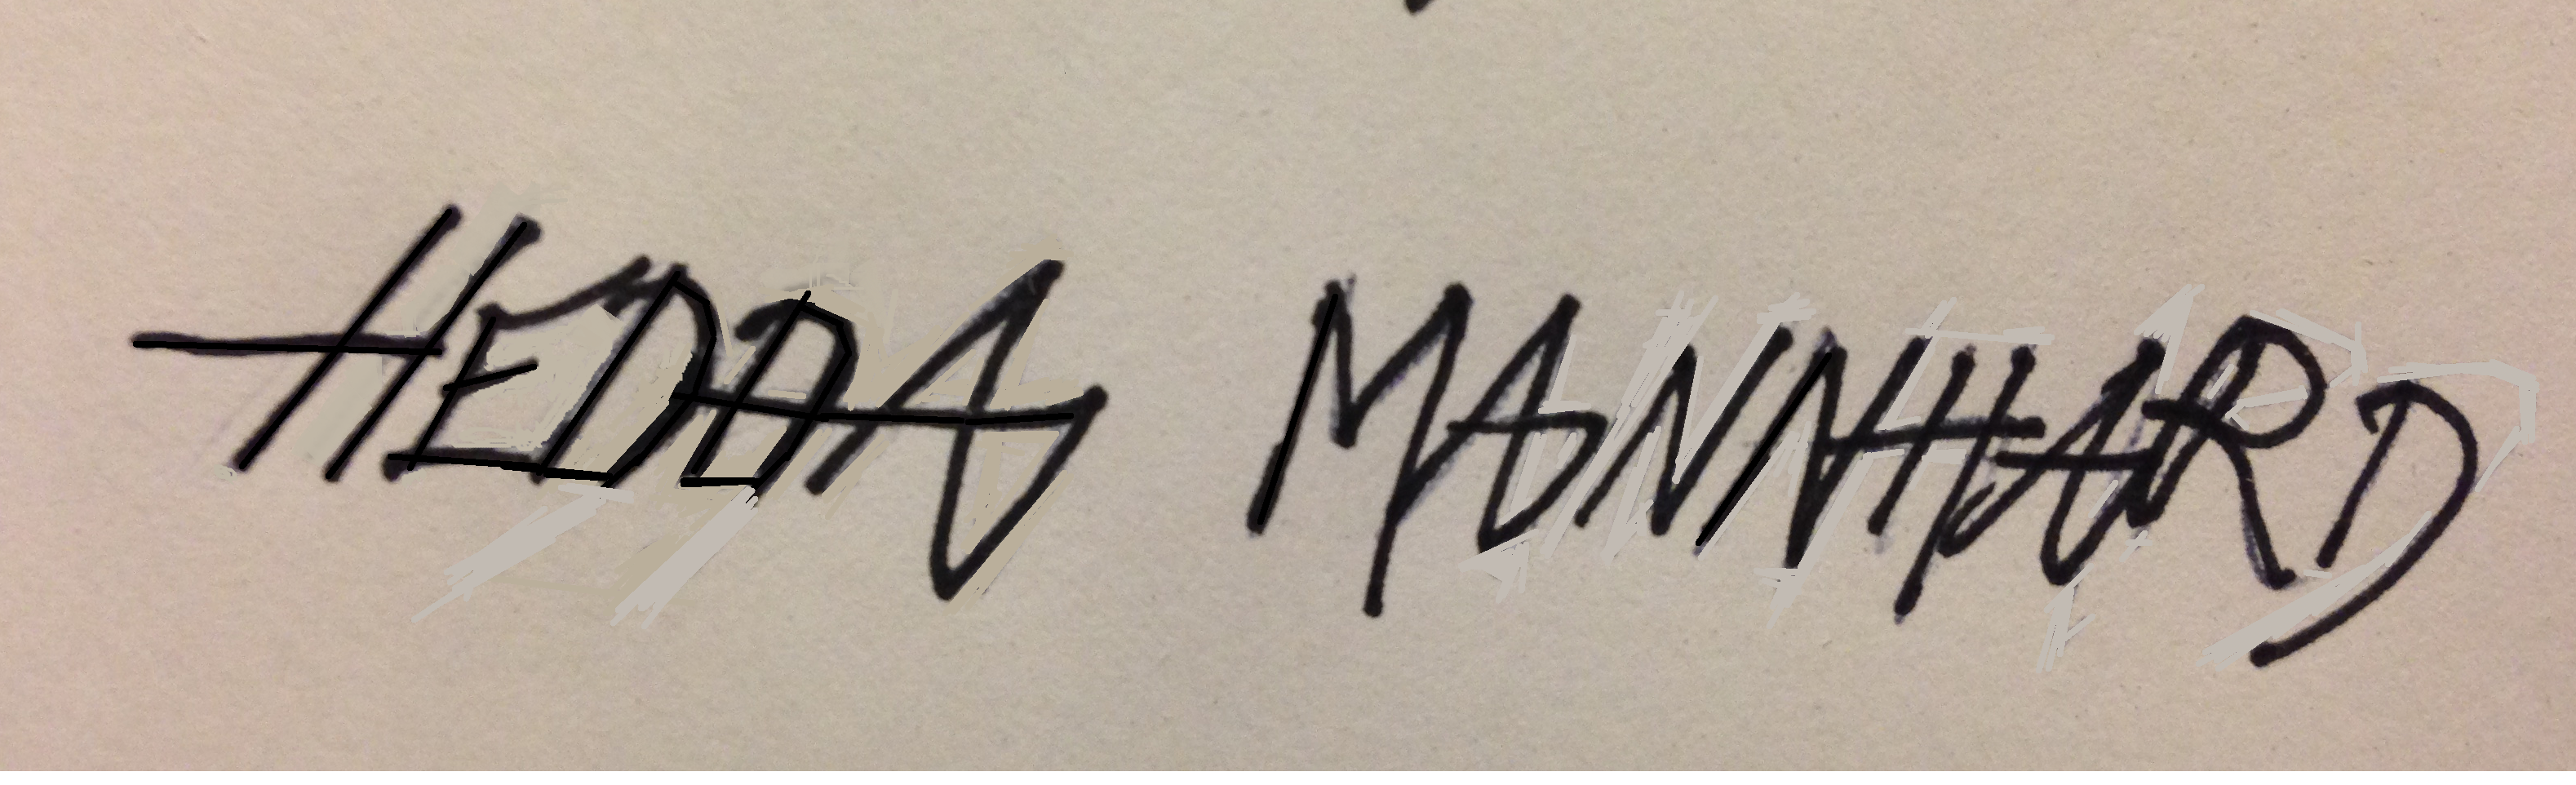 Hedda Mannhard's Signature